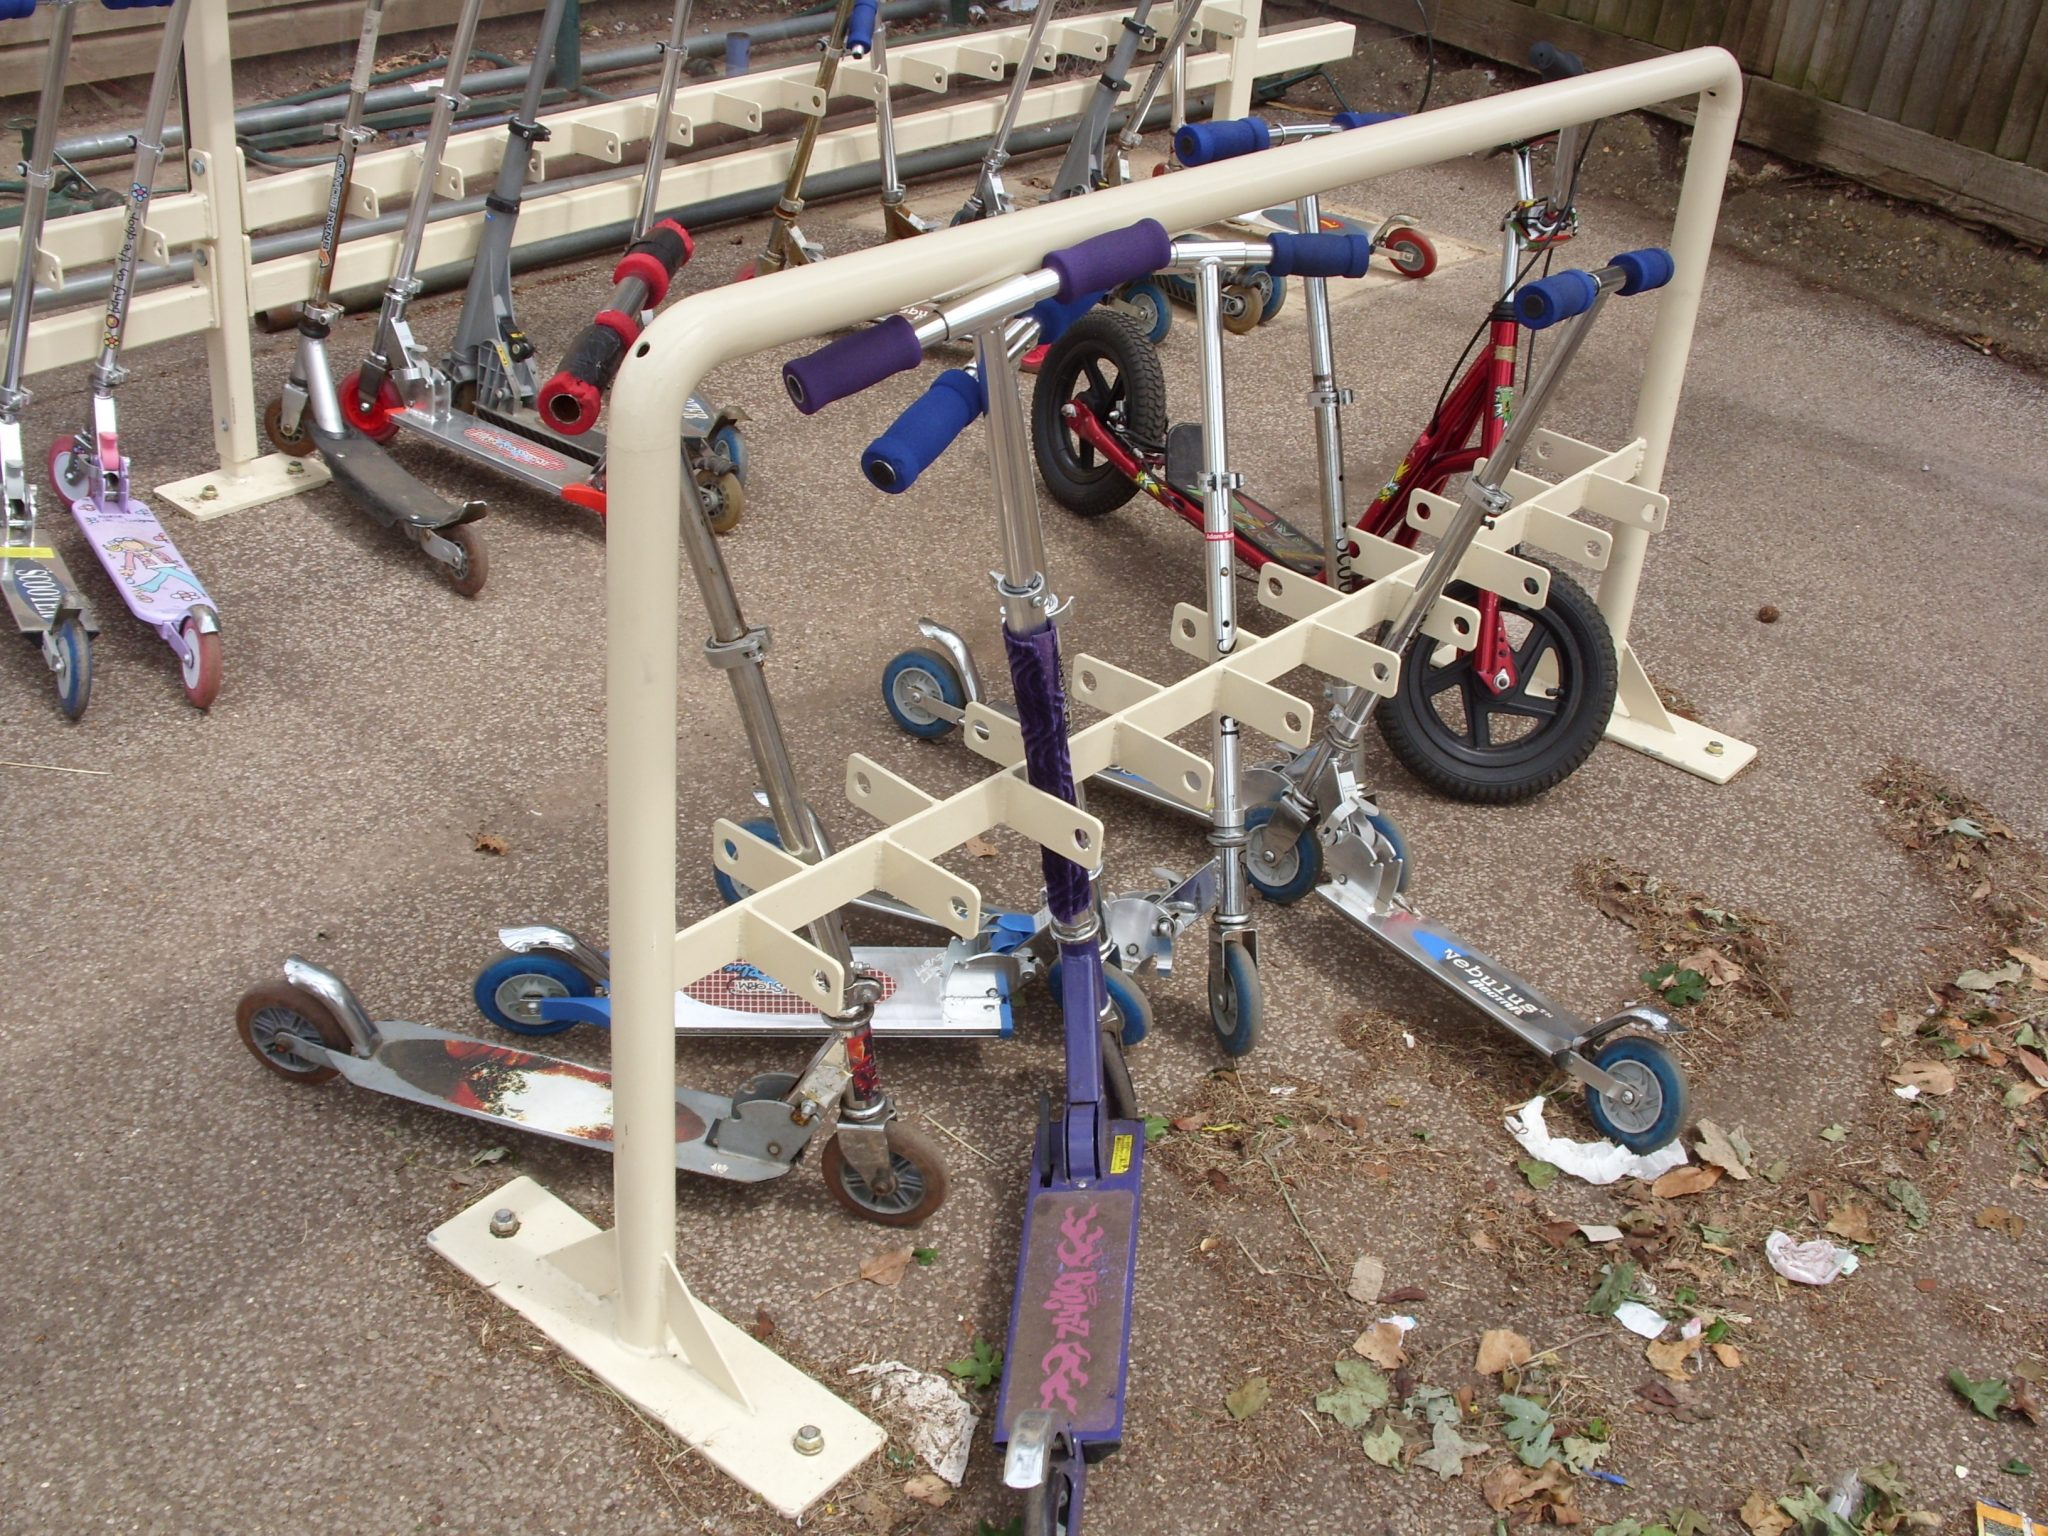 images of shoe racks